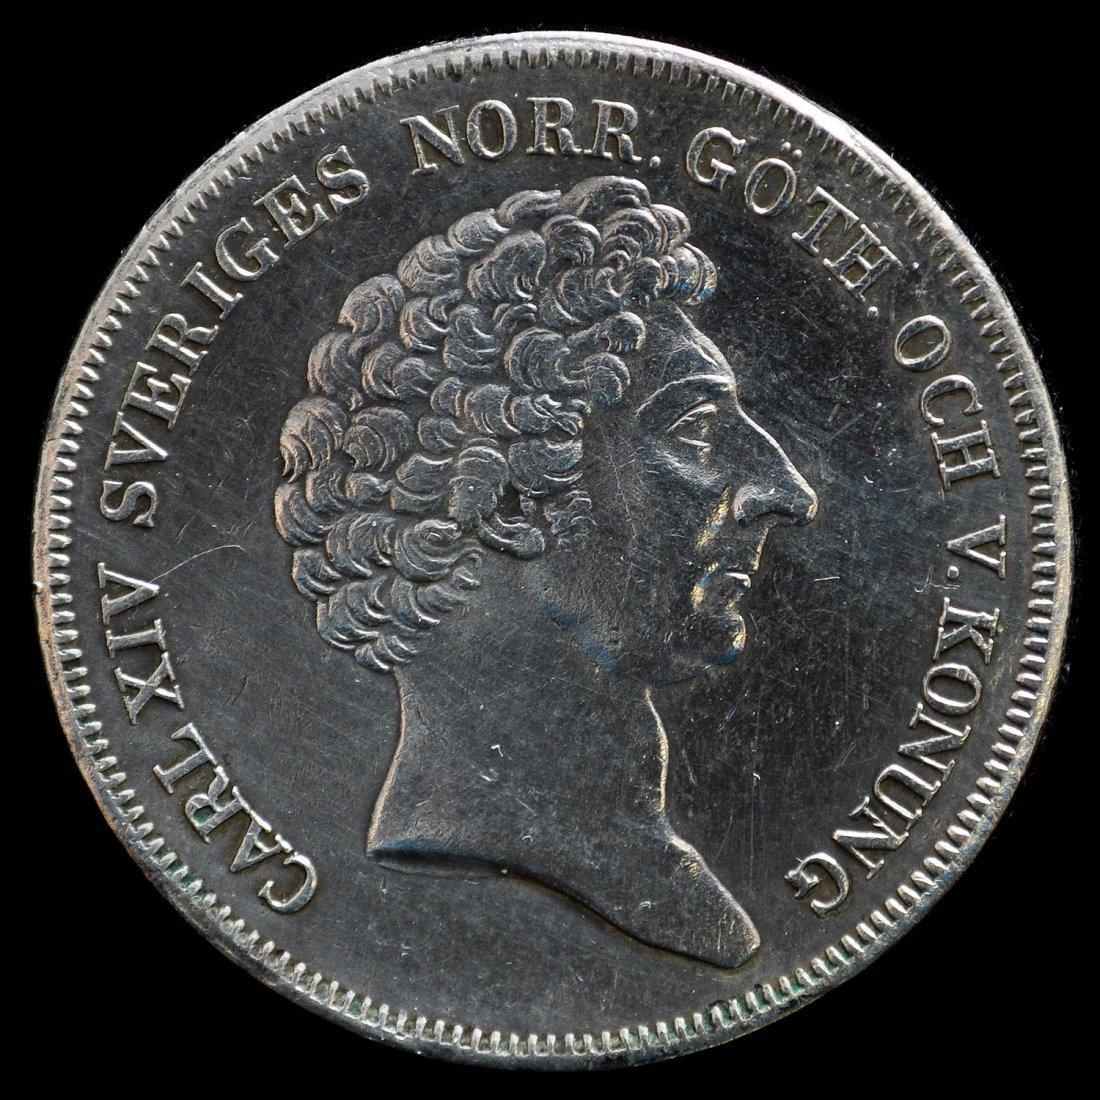 14: MYNT, 1 st, silver, Riksdaler 1841